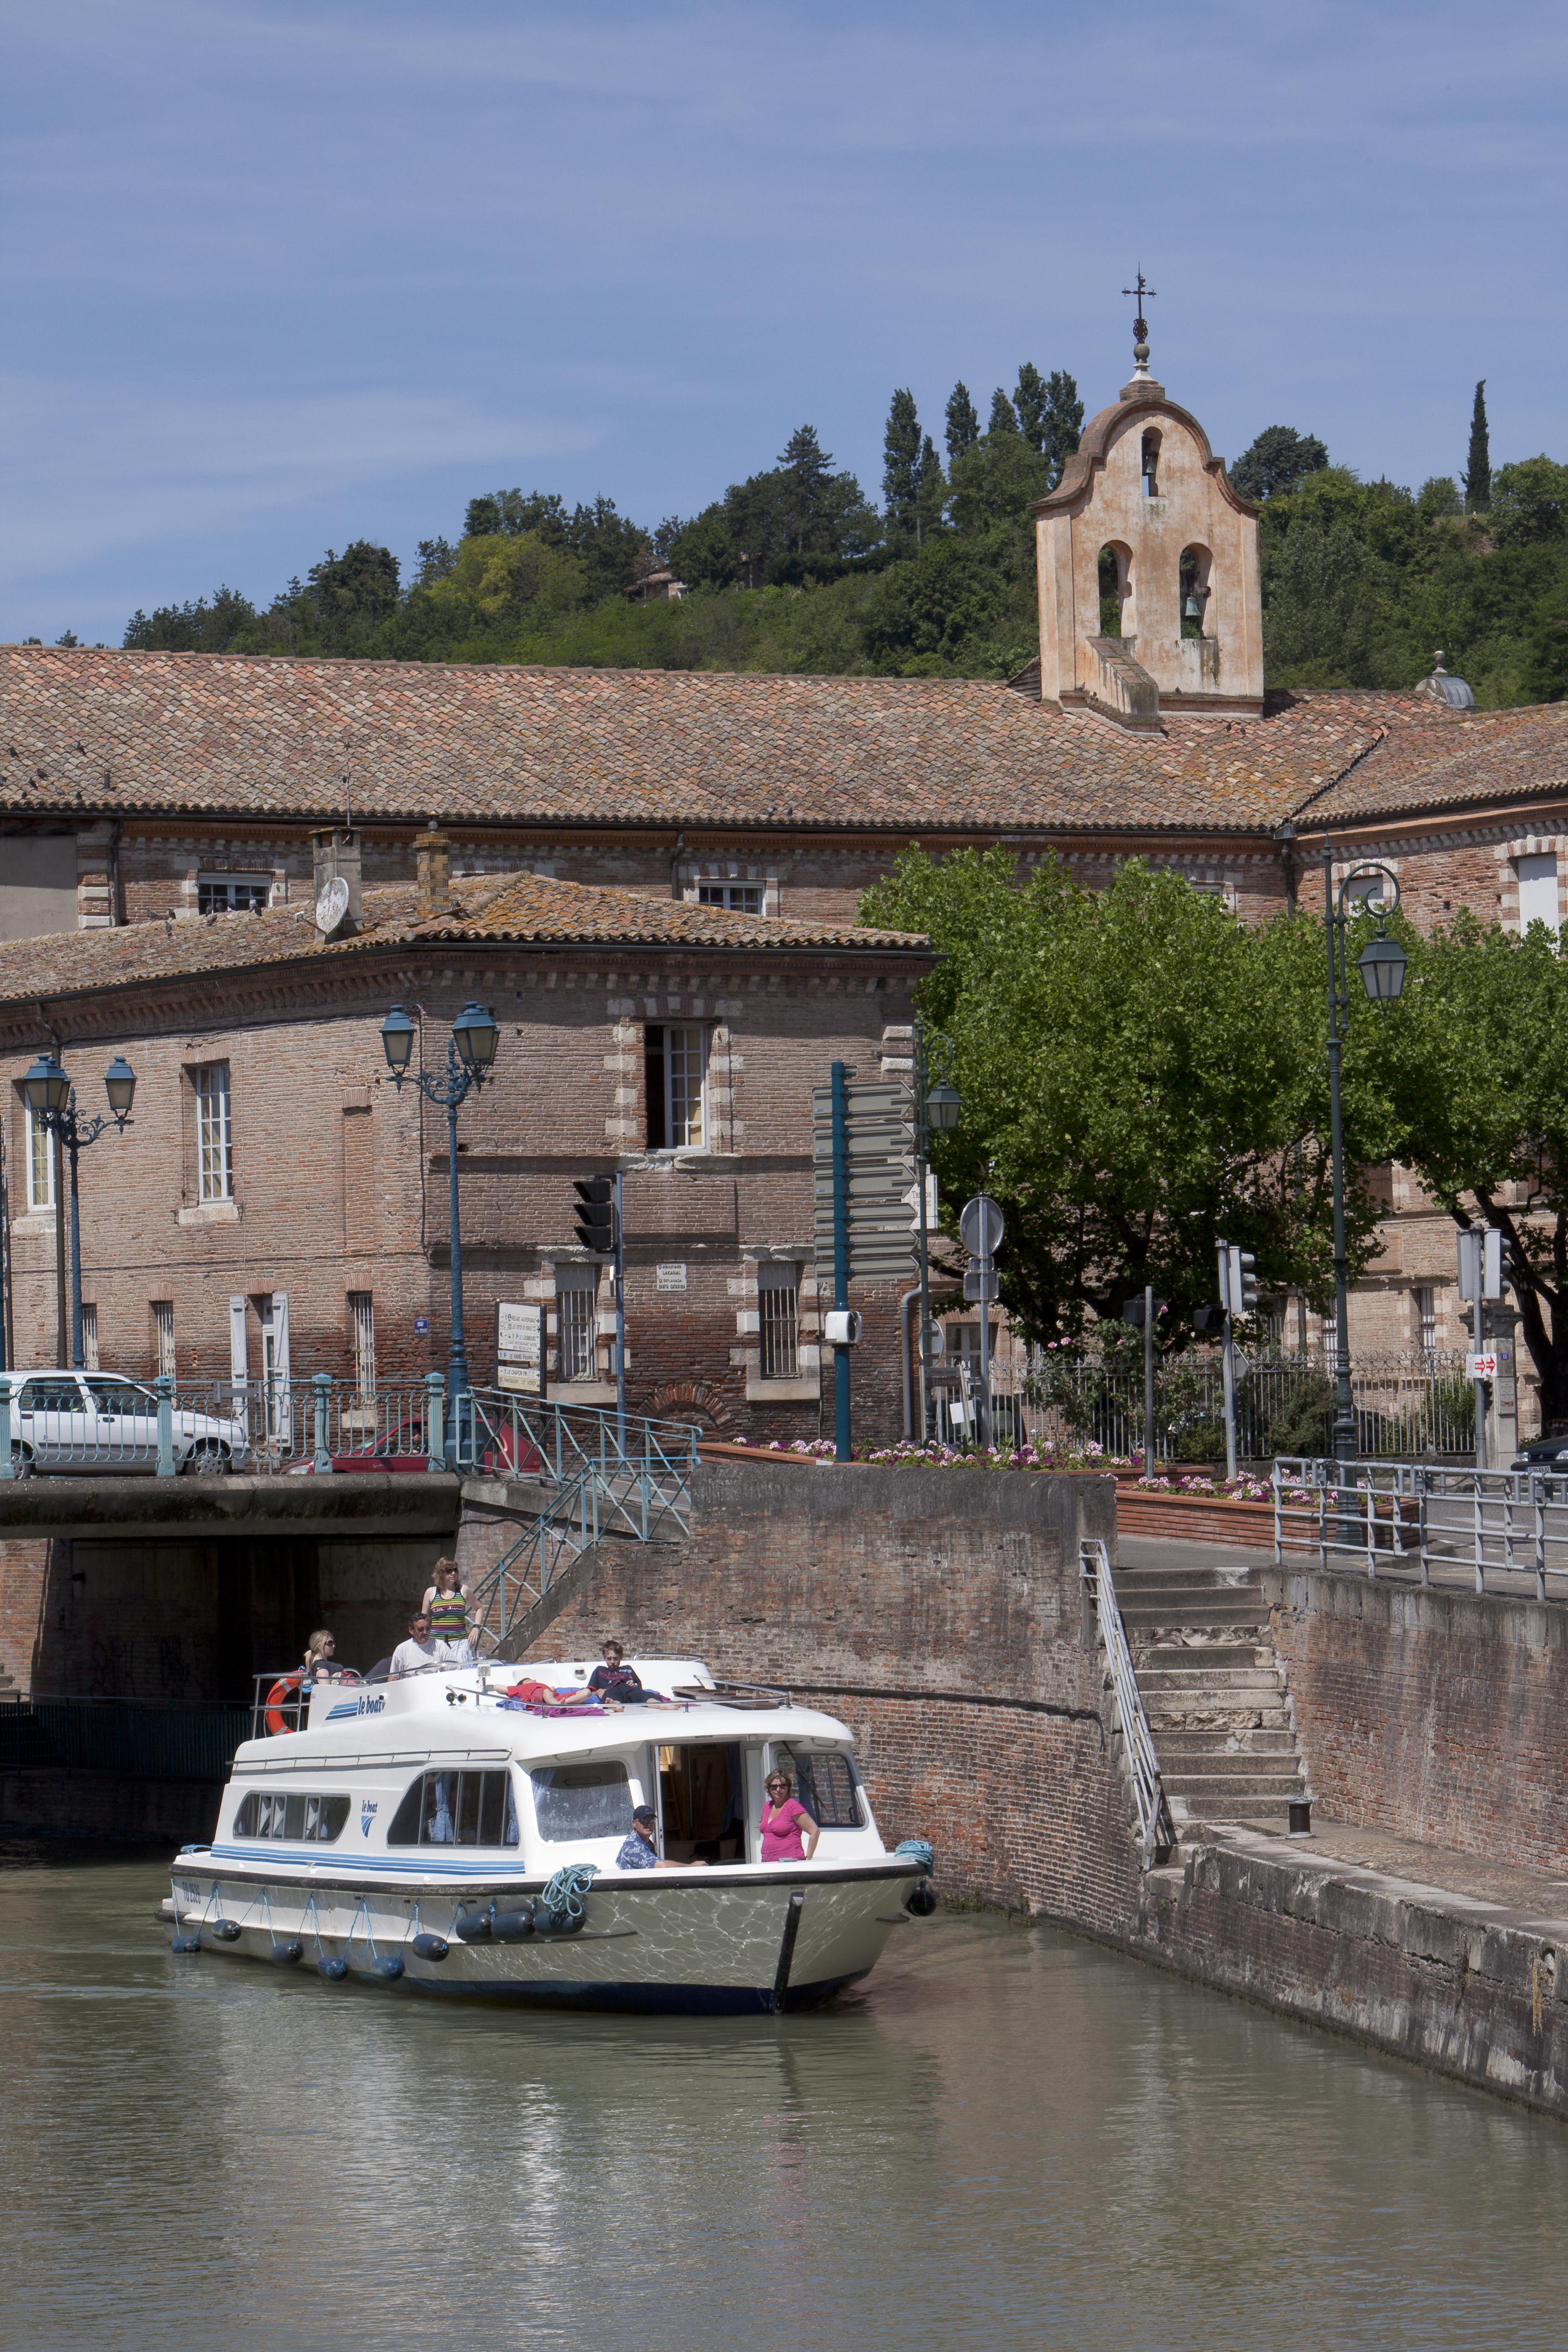 Le Mas-d Agenais (Le Boat)